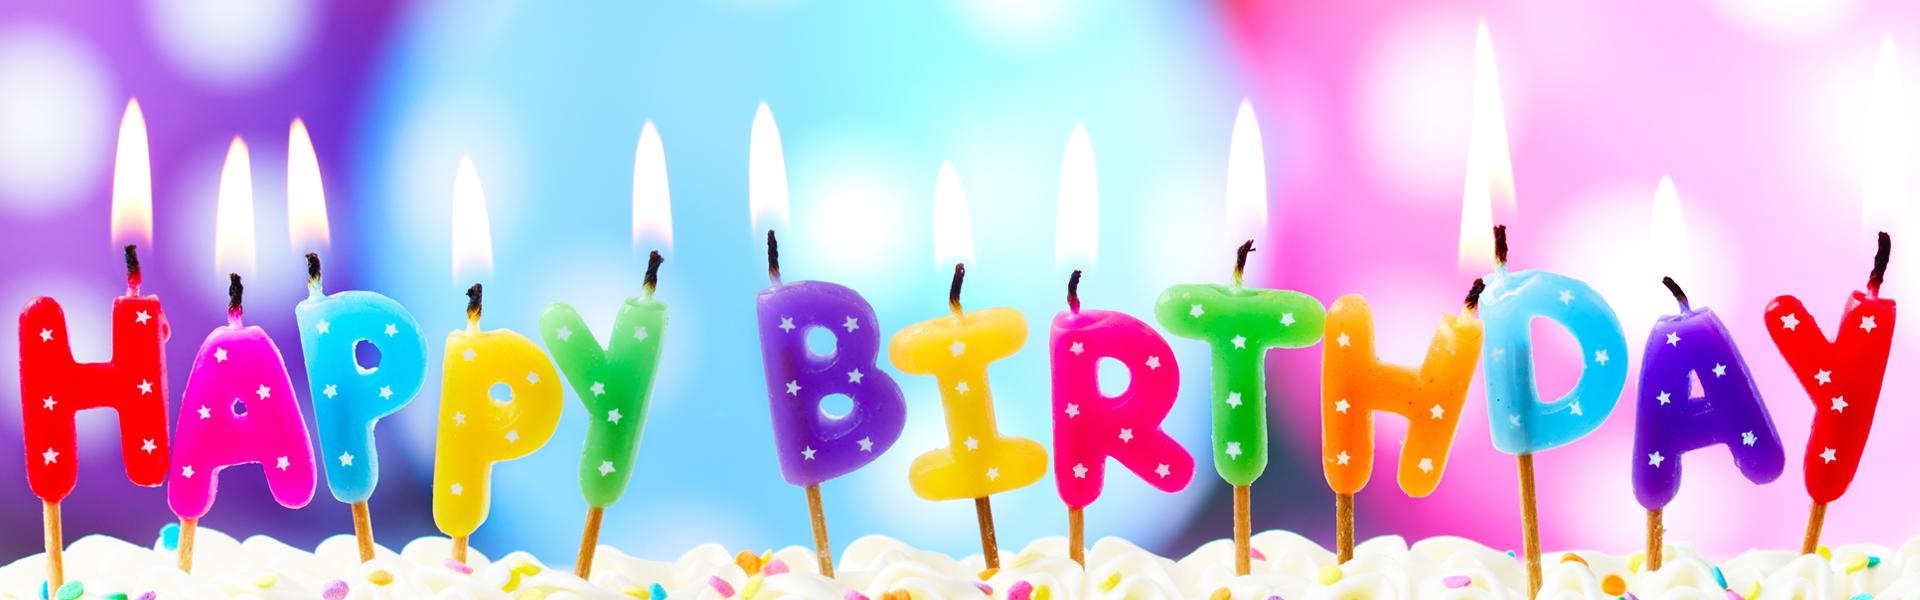 Background Birthday Cake Candle Birthday Cake Candle Happy